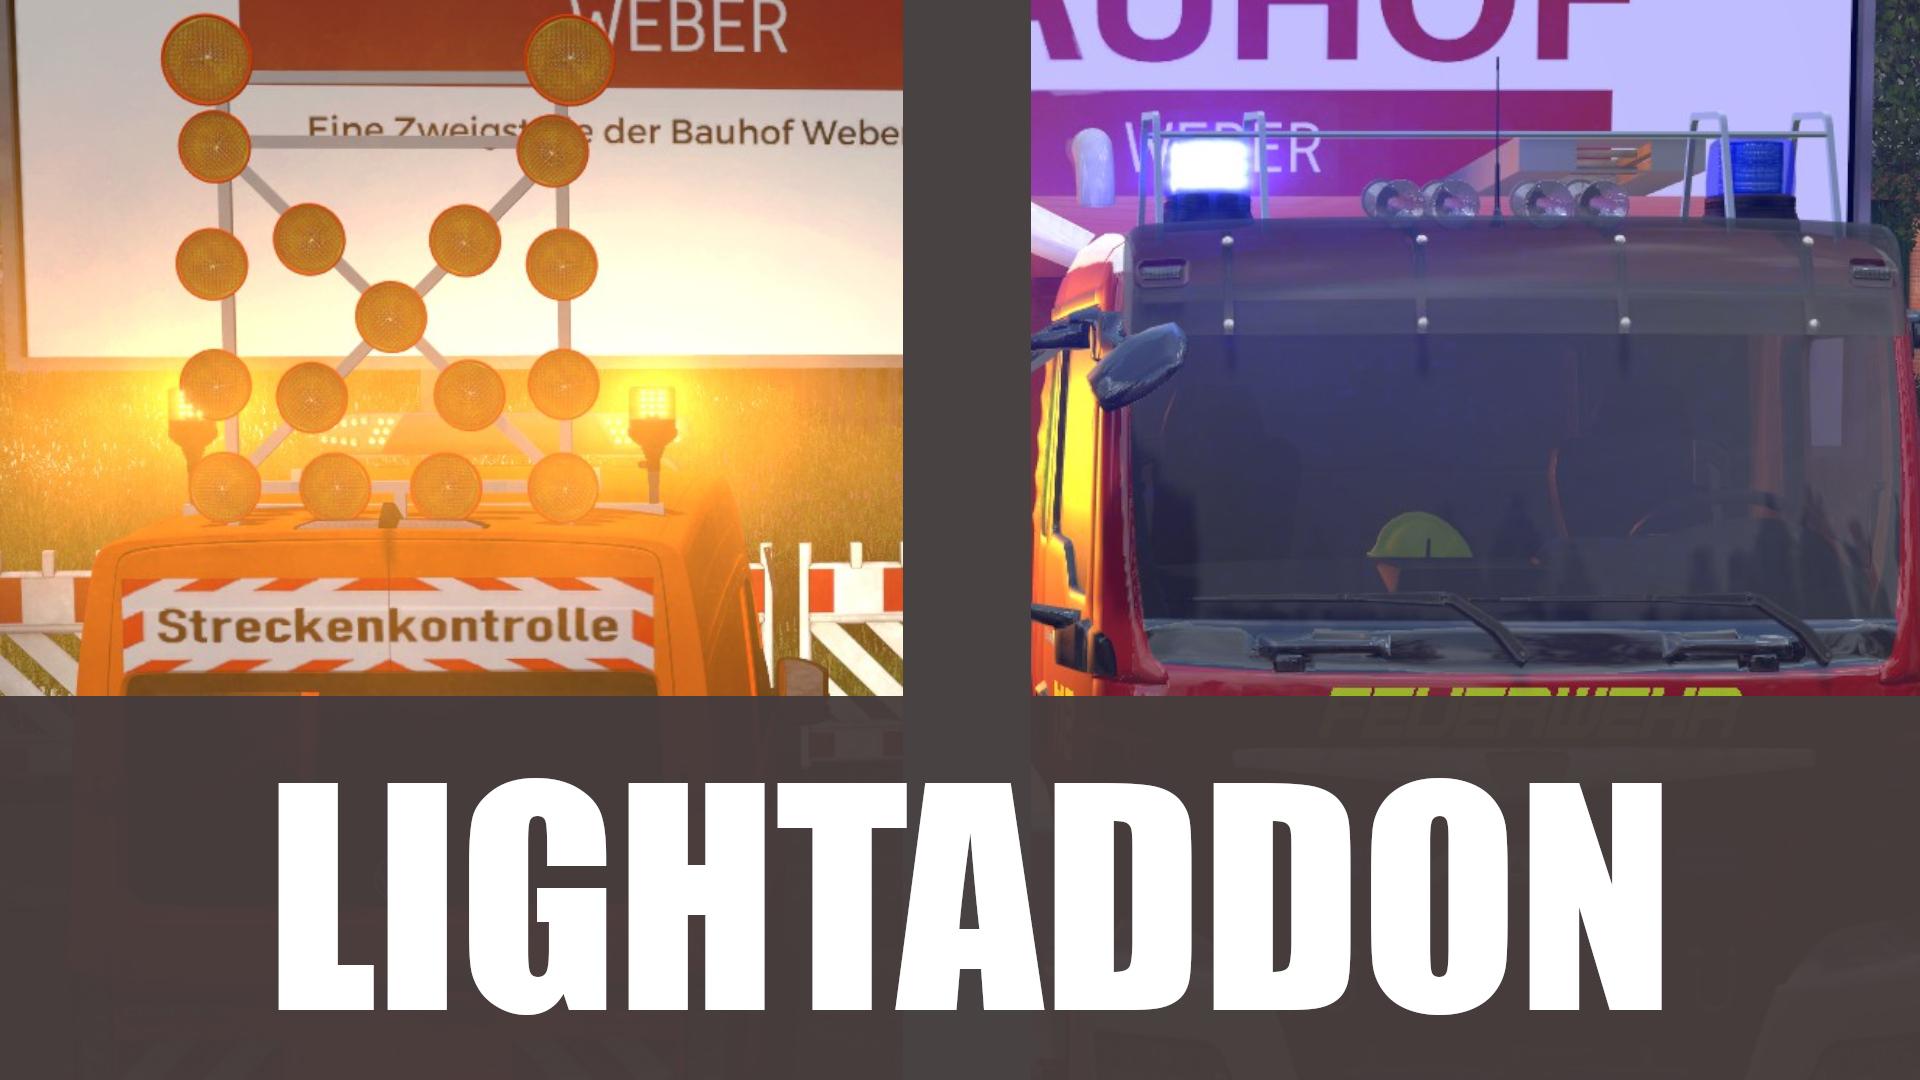 Lightaddon